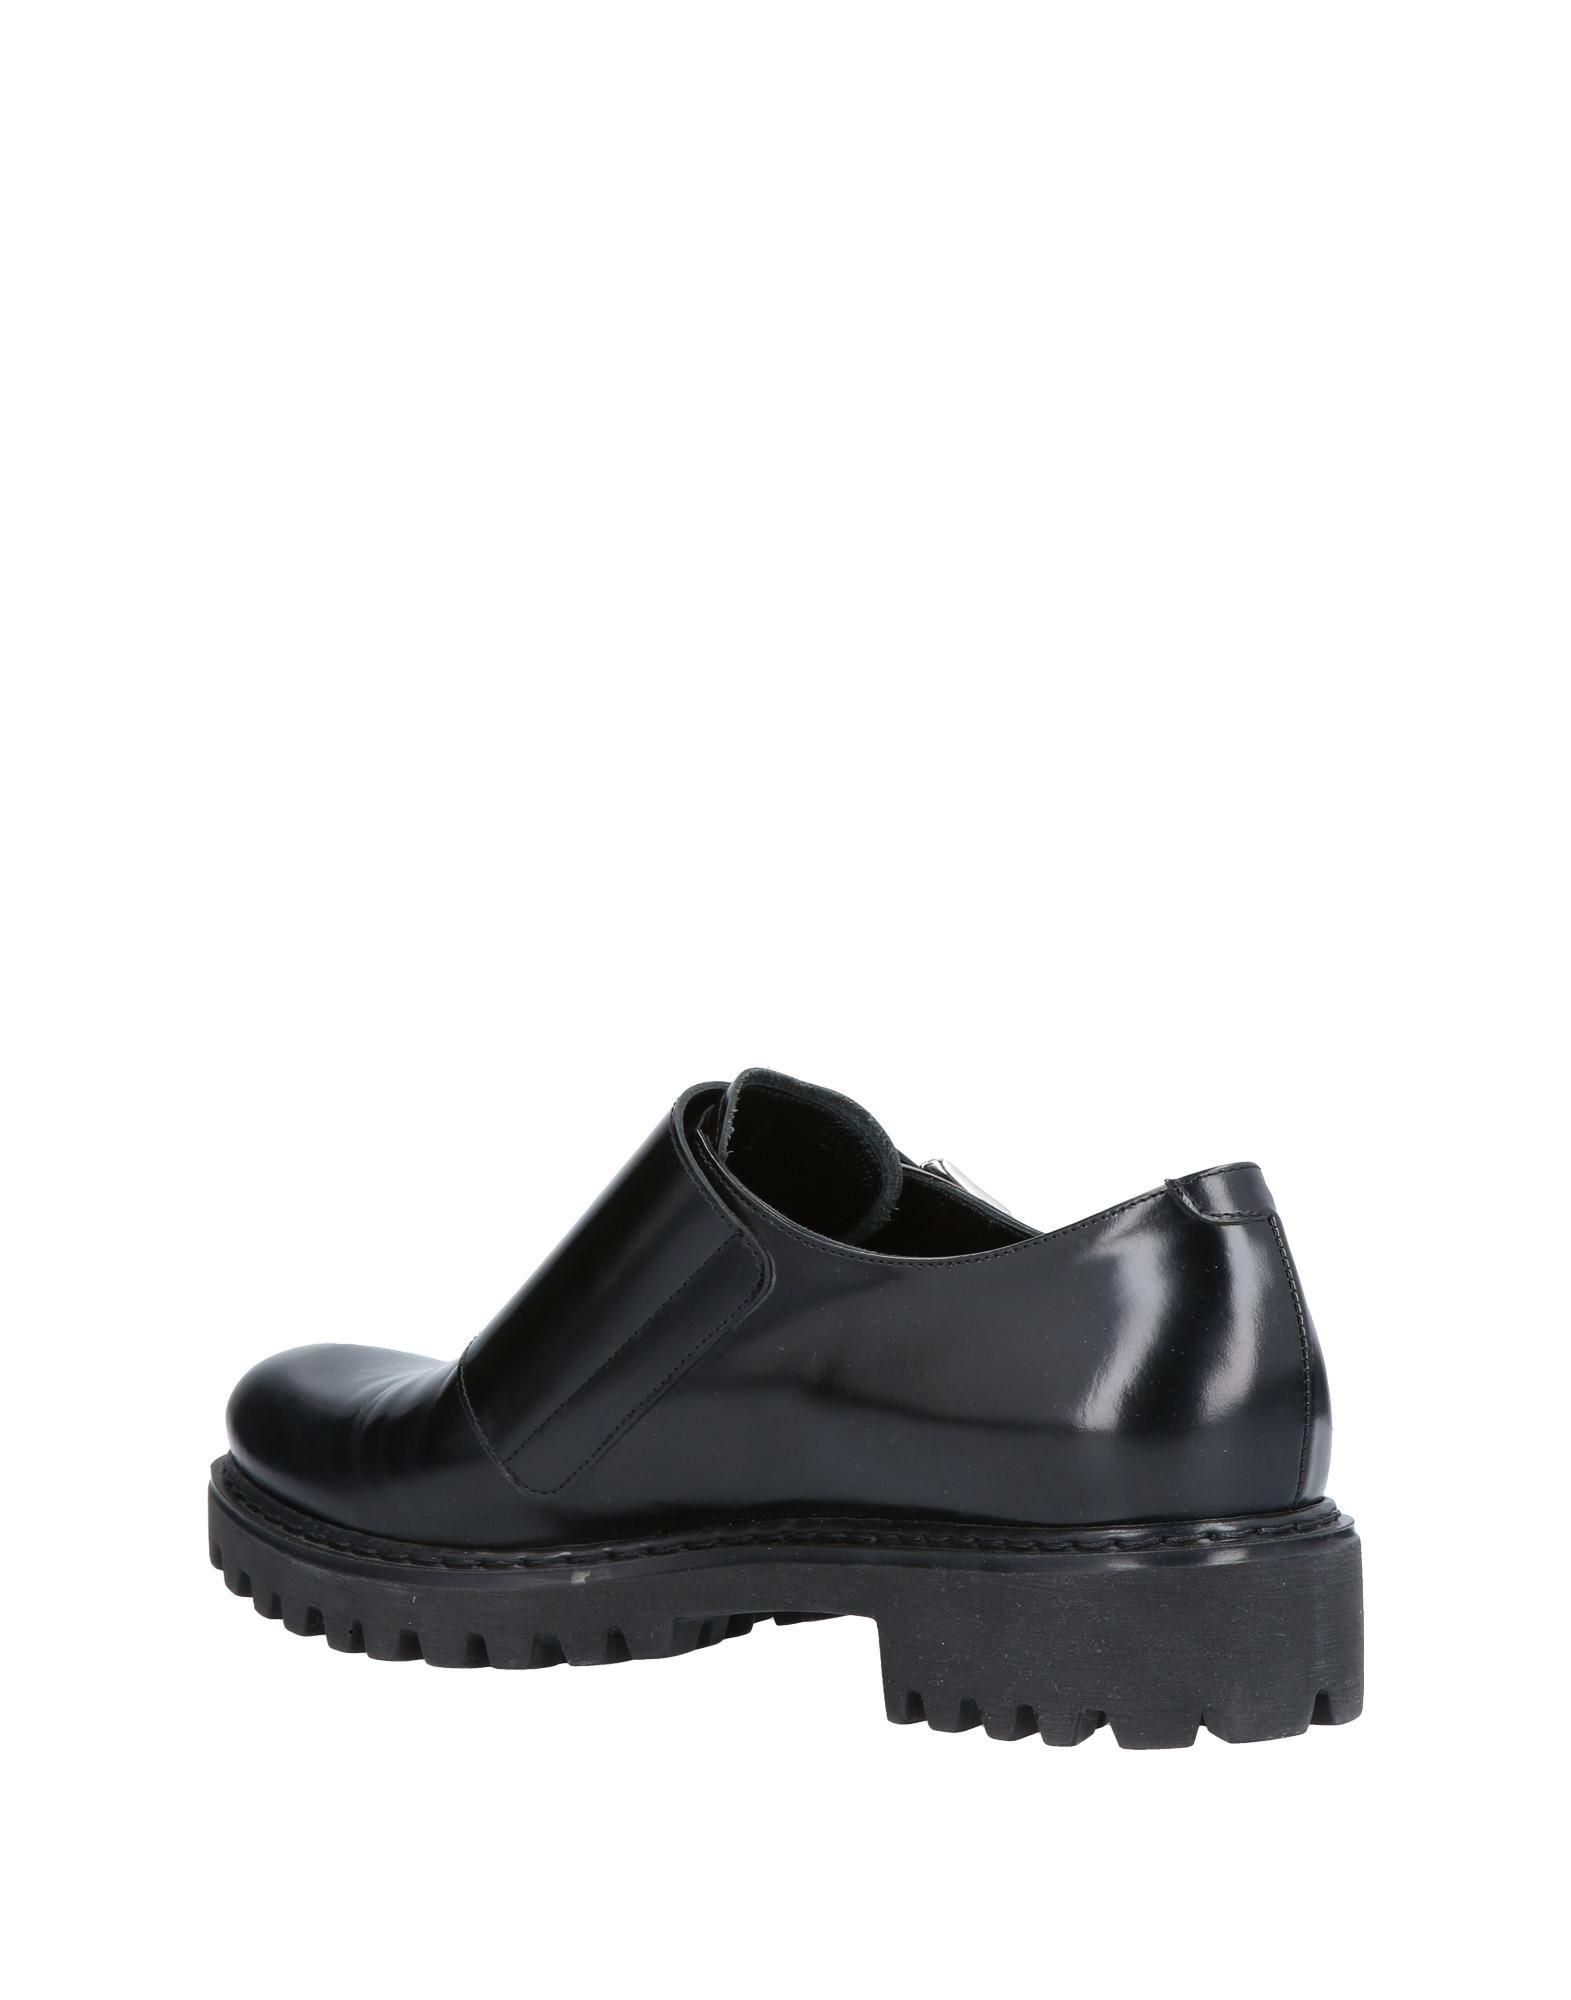 Guglielmo 11483458XH Rotta Mokassins Damen  11483458XH Guglielmo Gute Qualität beliebte Schuhe 981d59